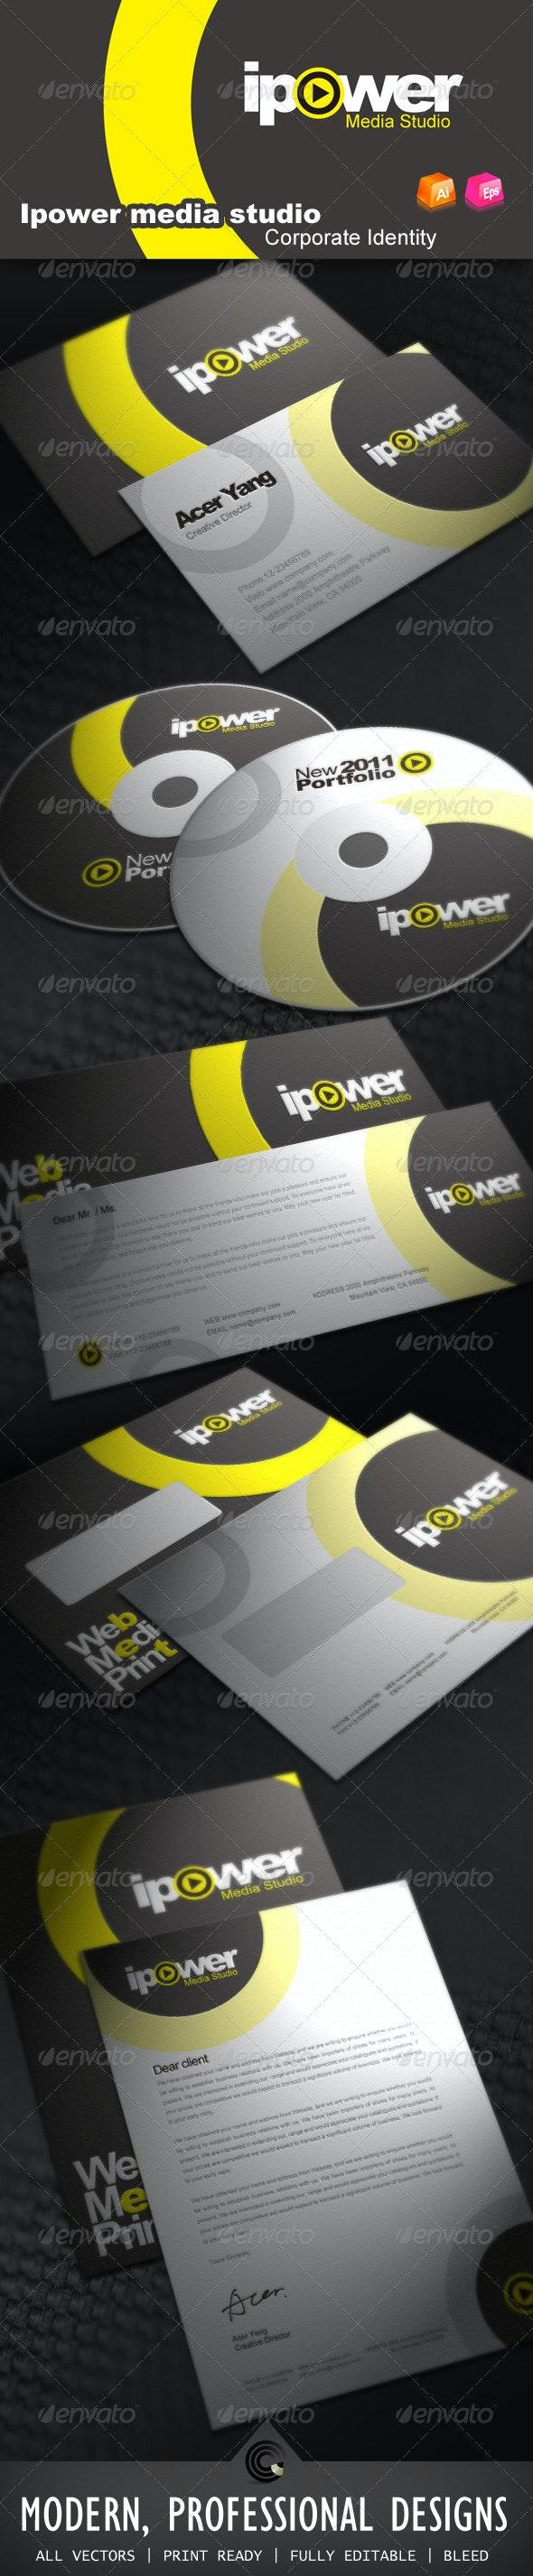 Ipower Midea Studio Corporate Identity - Stationery Print Templates